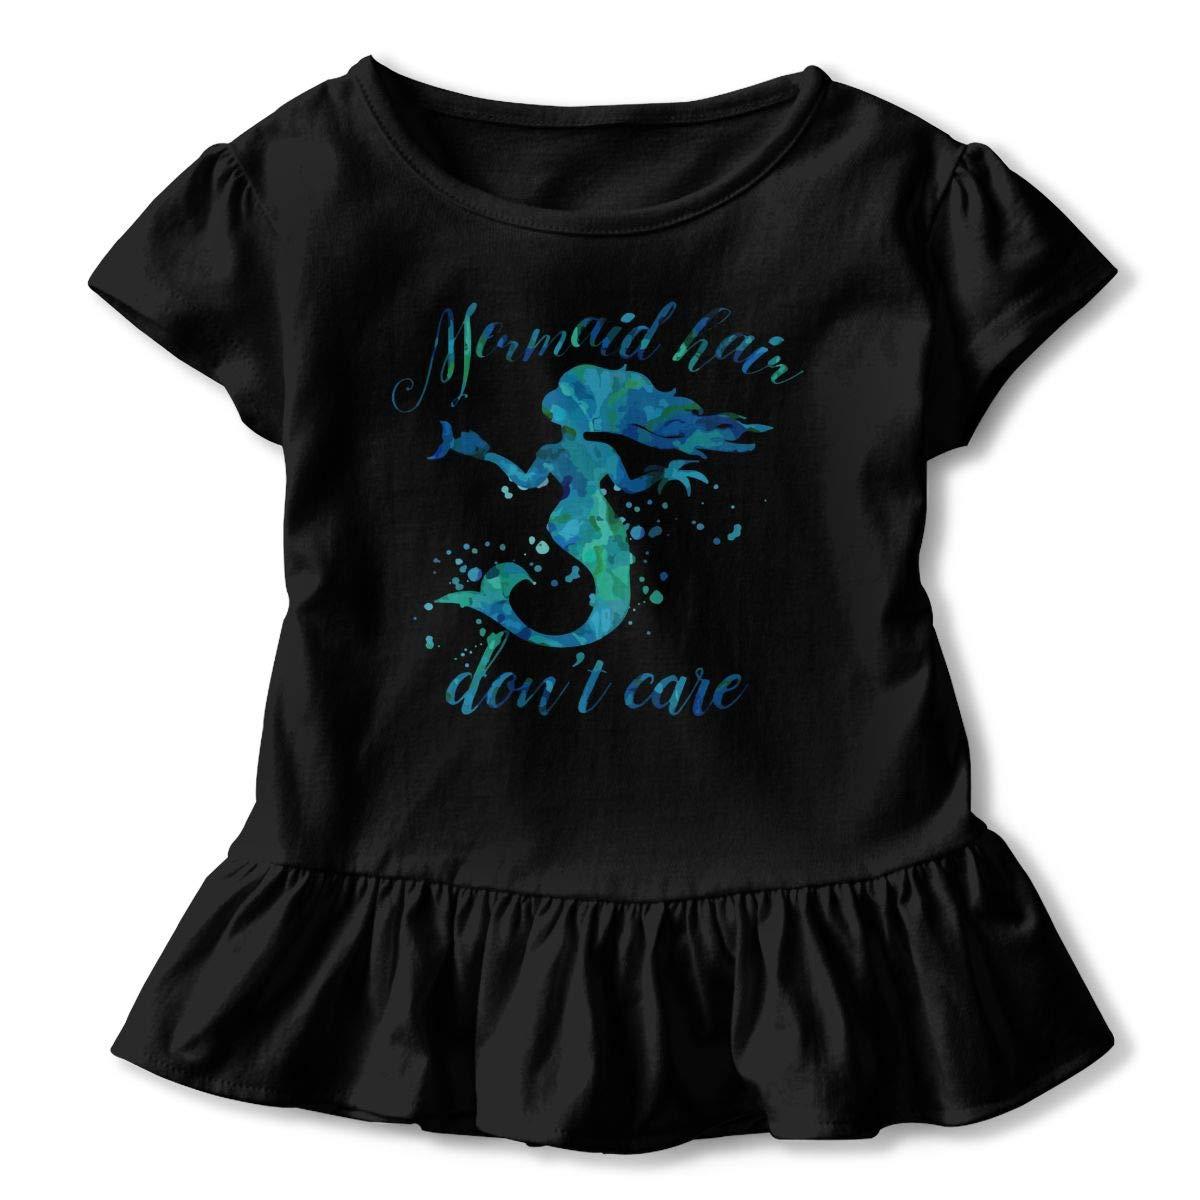 CZnuen Mermaid Hair Dont Care 2-6T Baby Girls Cotton Jersey Short Sleeve Ruffle Tee